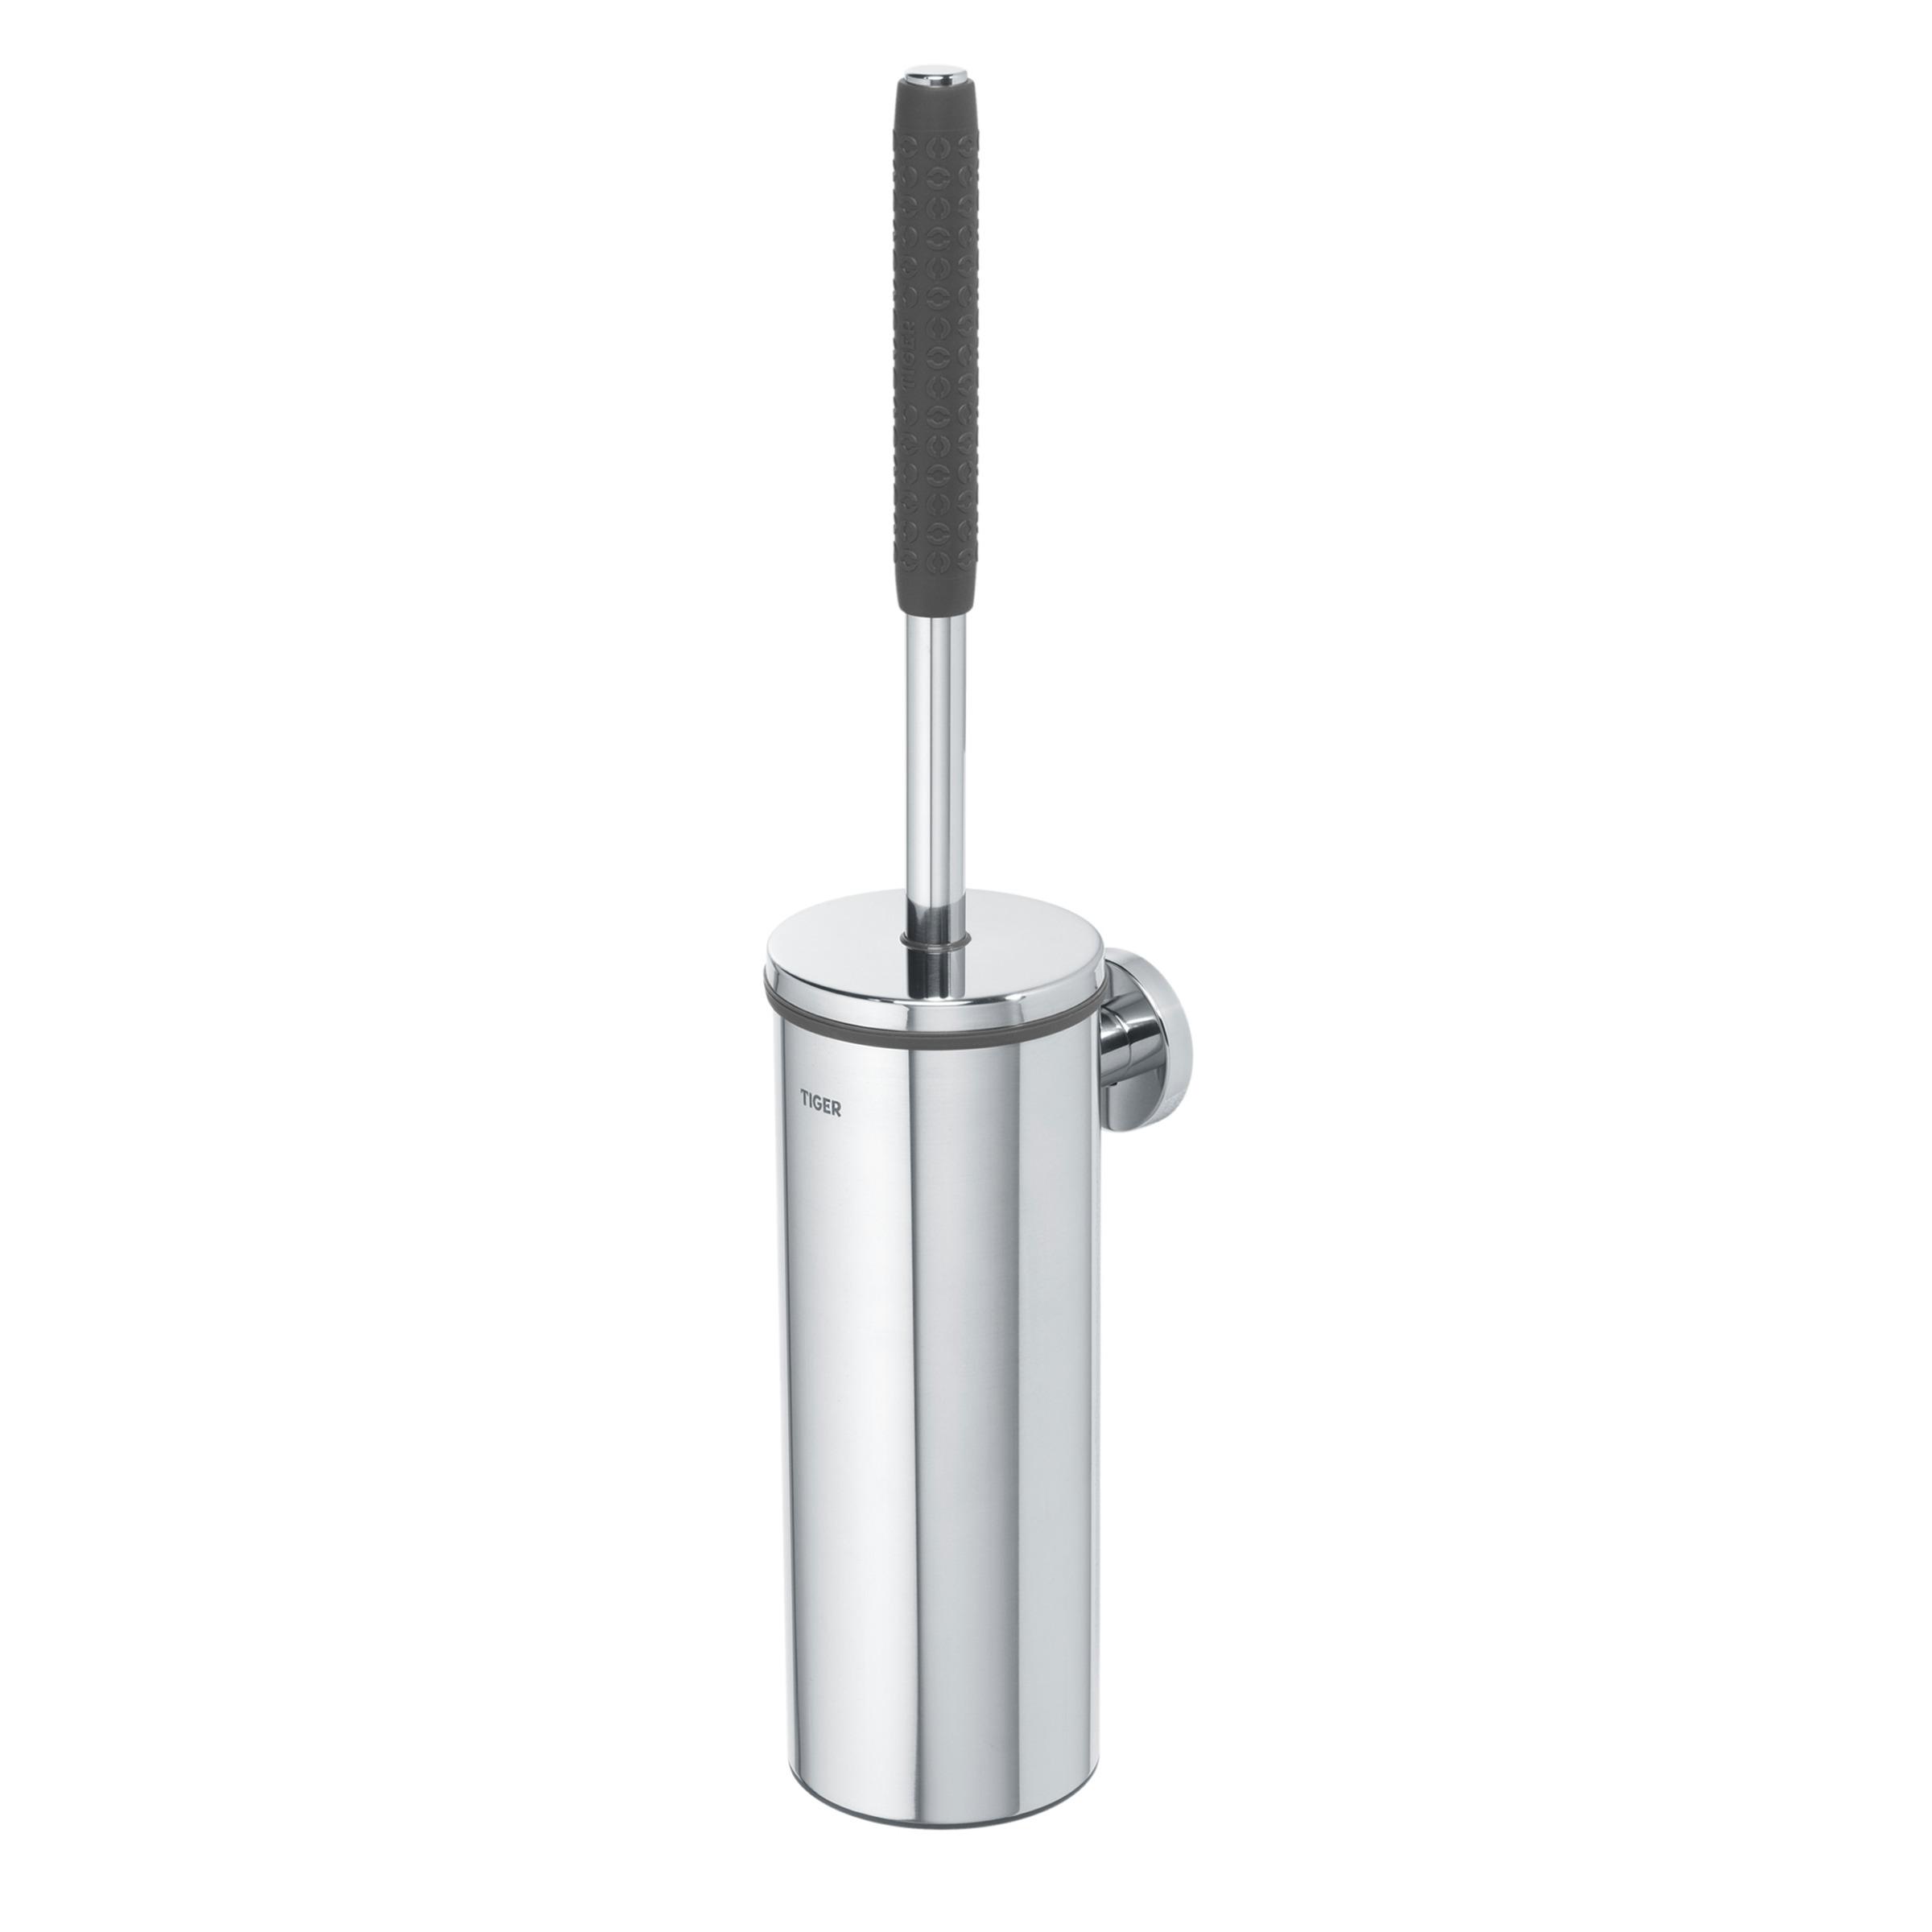 Tiger Boston Comfort & Safety toiletborstel met houder, rvs glans